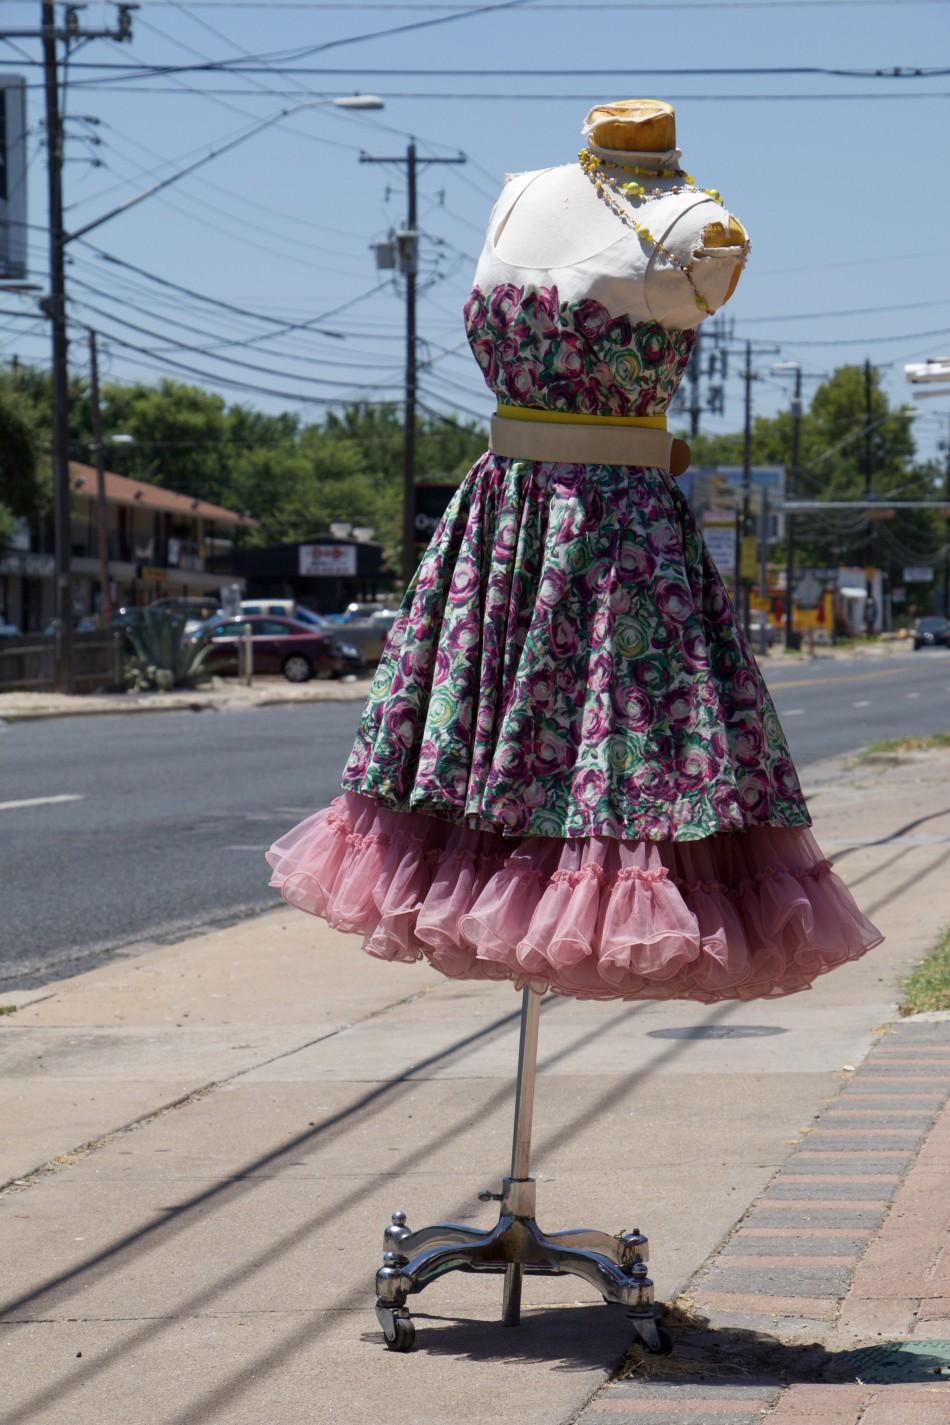 Dressy Display (Straight From Camera)